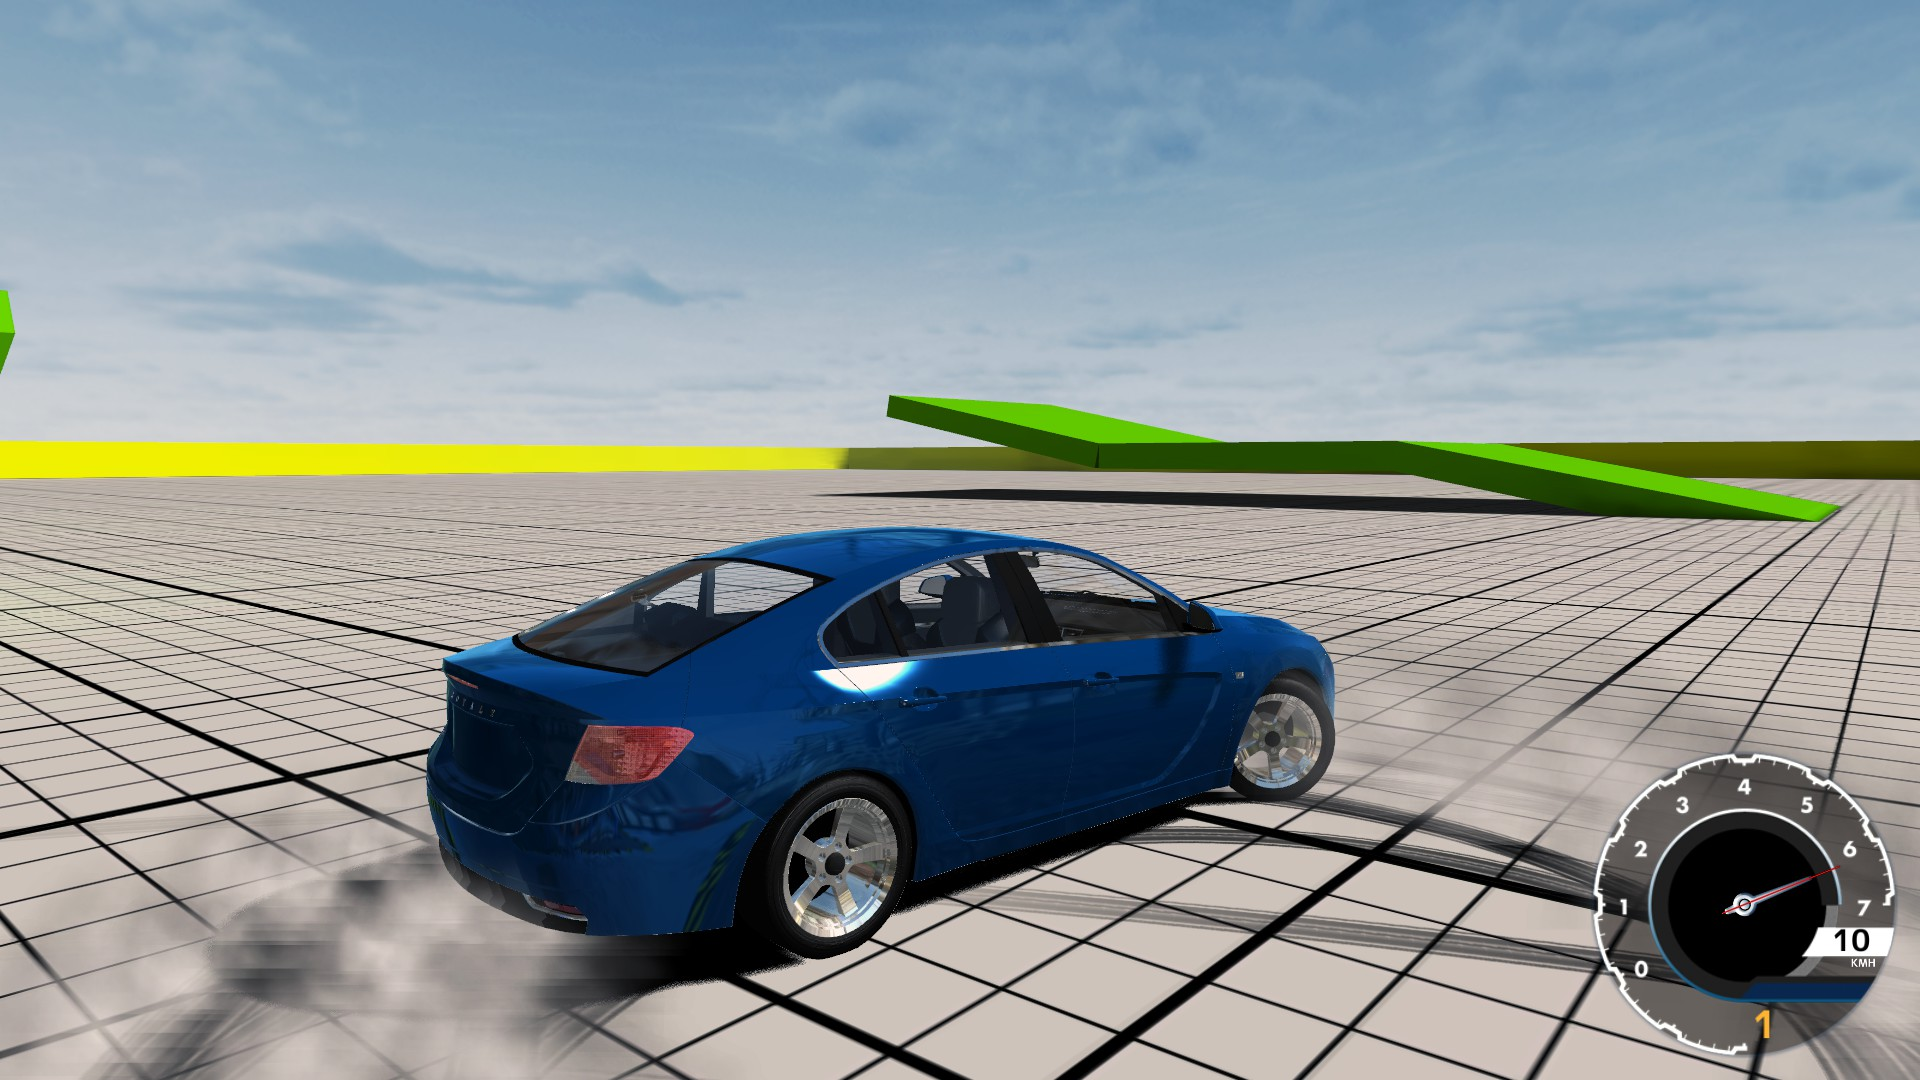 Car Mechanic Simulator 2015 Modlama Destegi Basladi